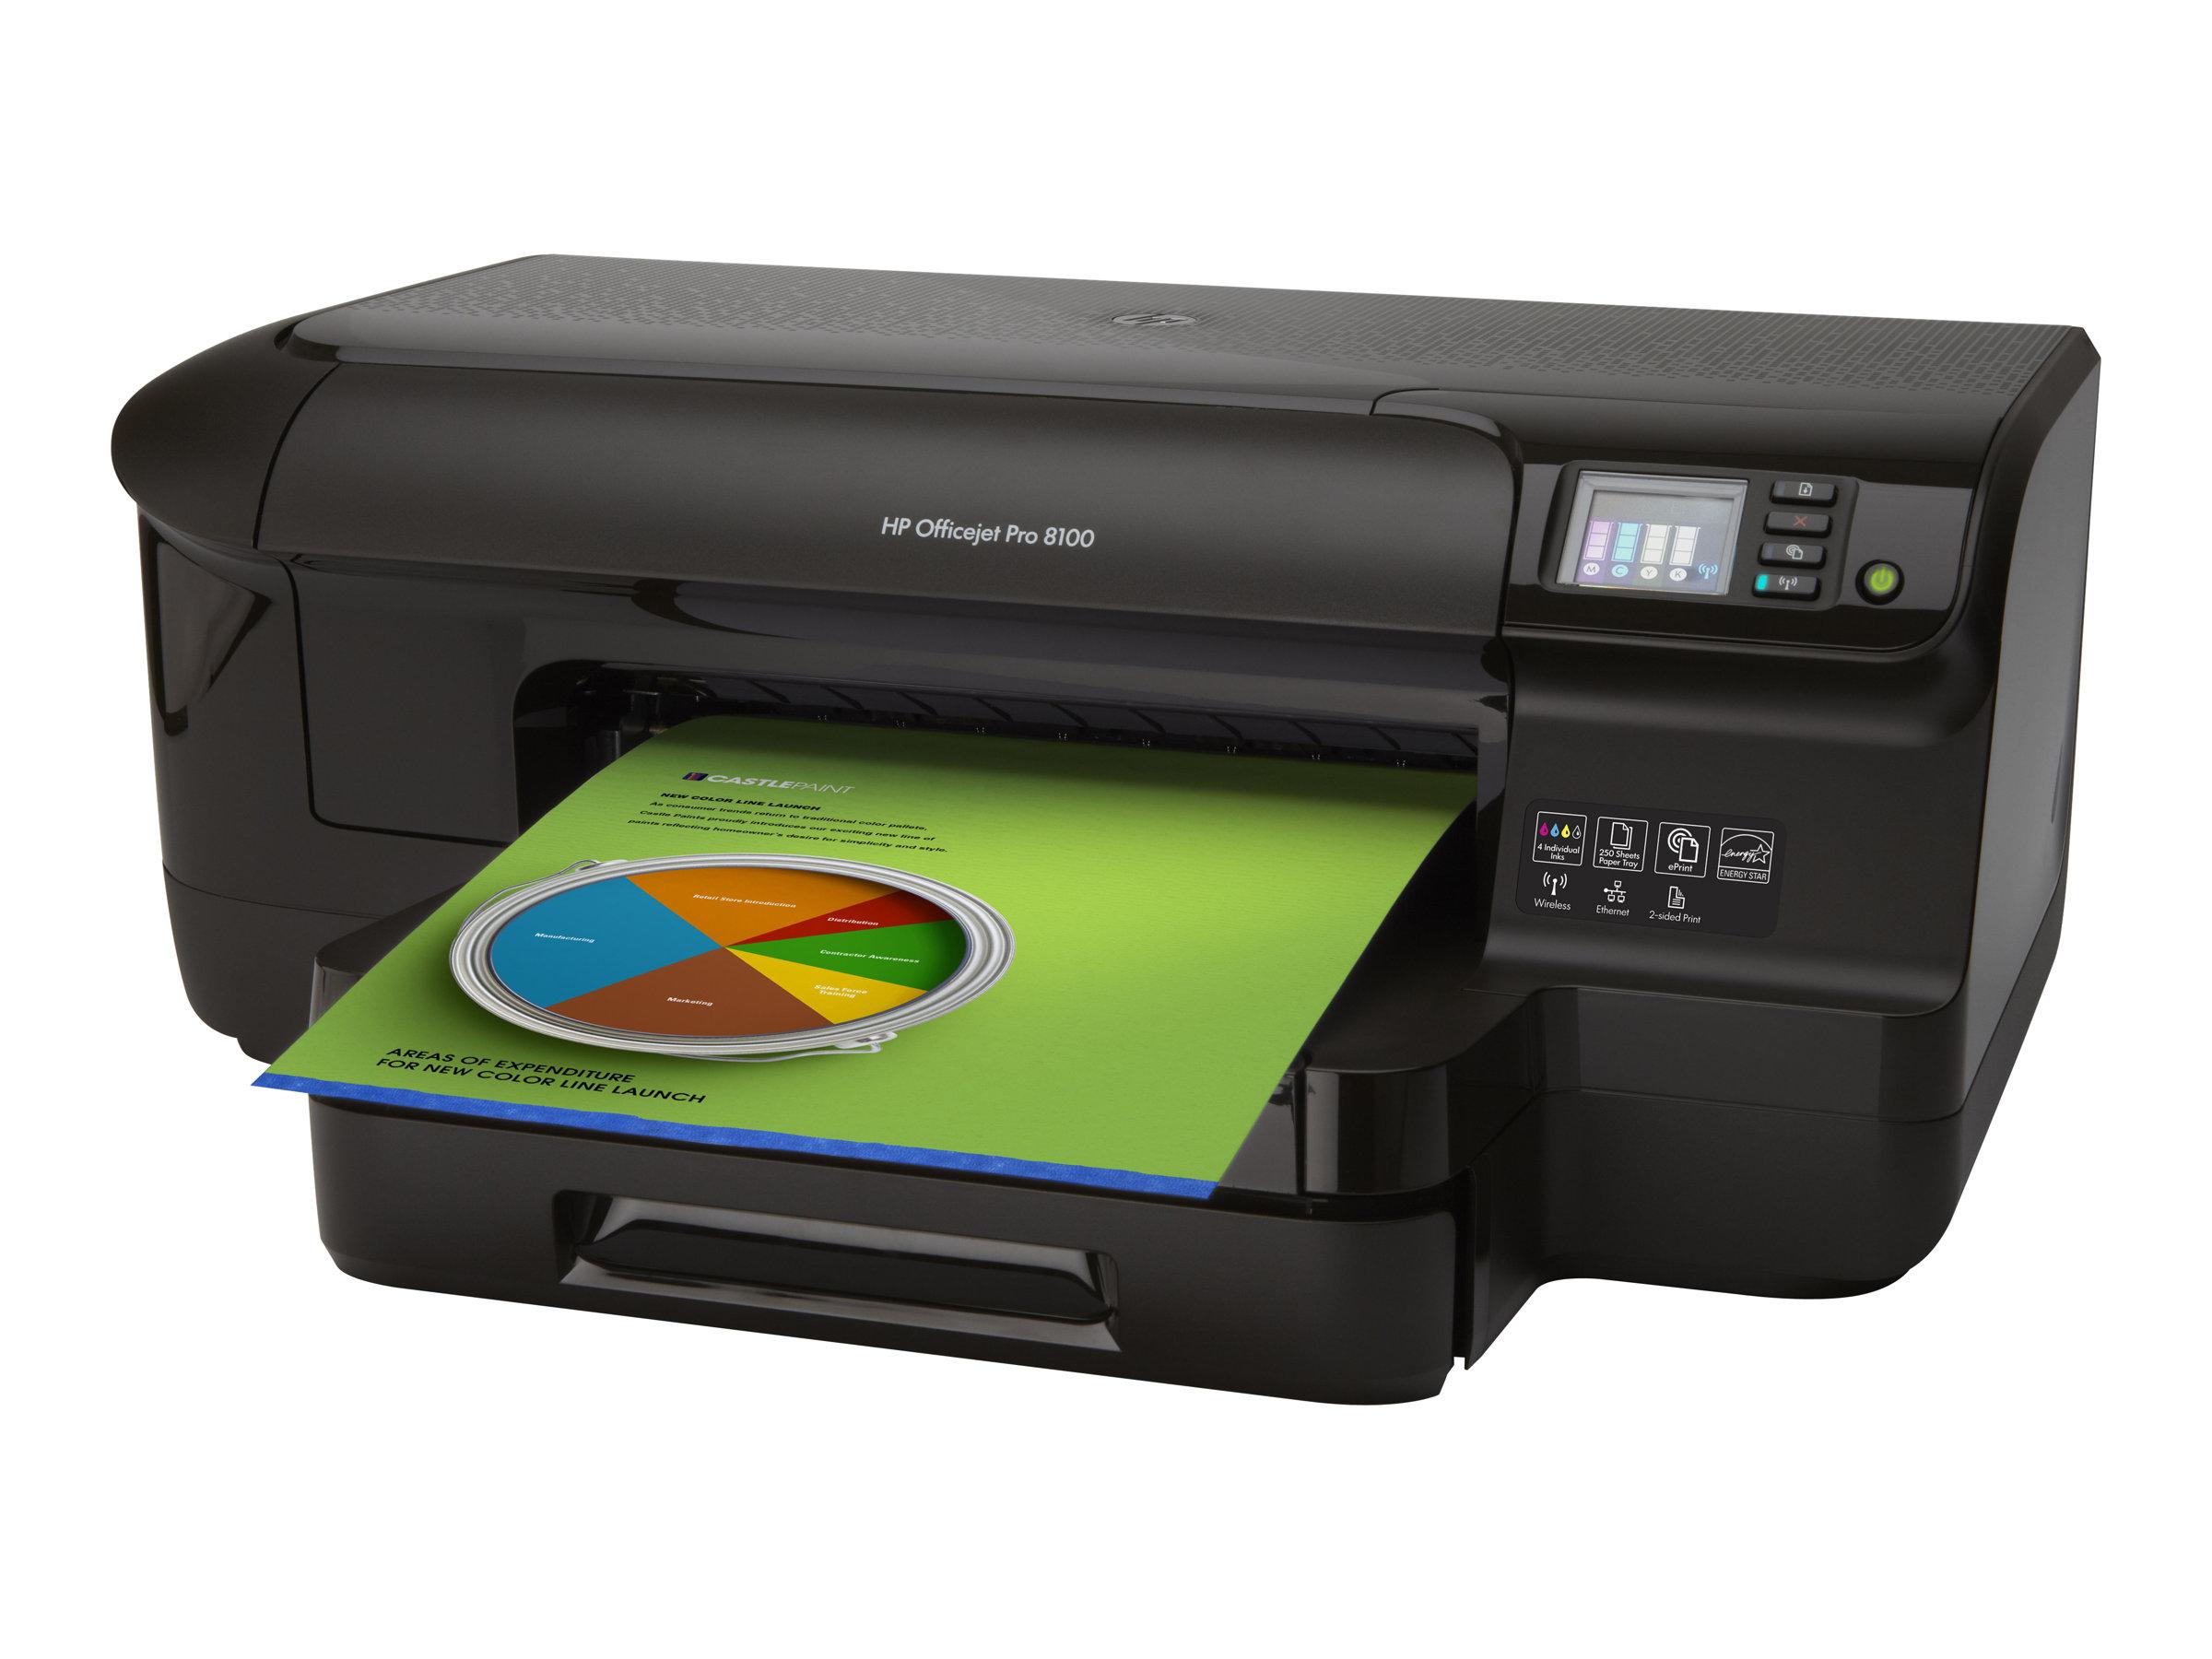 HP Officejet Pro 8100 ePrinter N811a - Drucker - Farbe - Duplex - Tintenstrahl - A4/Legal